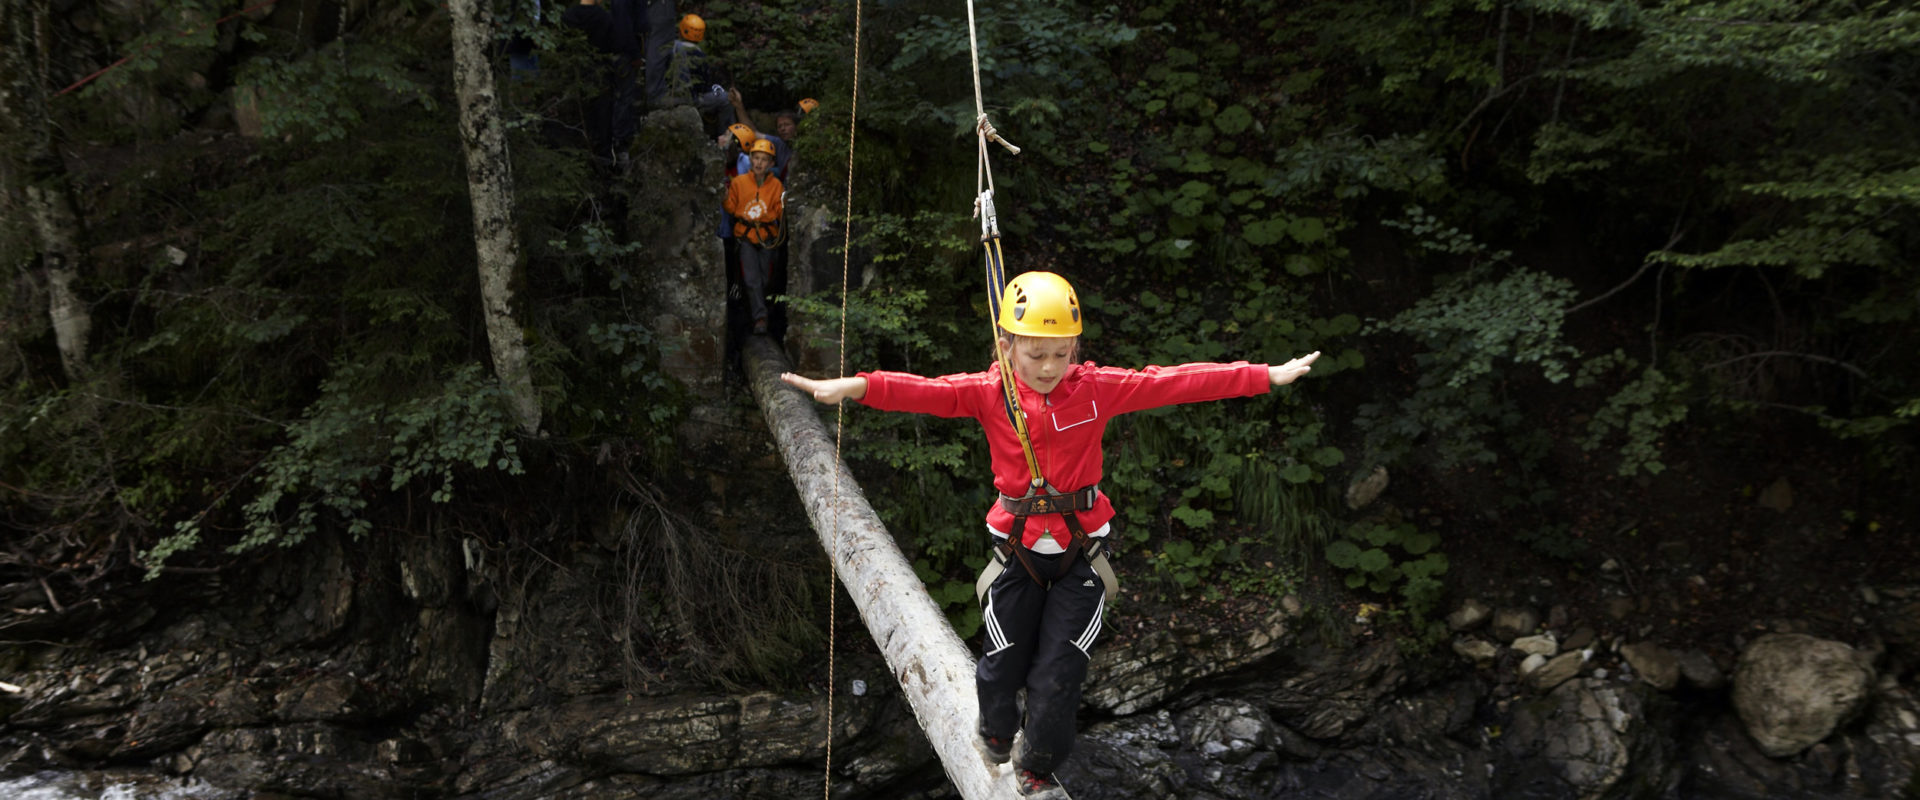 Kinder Abenteuertag © Christoph Lingg / Bregenzerwald Tourismus